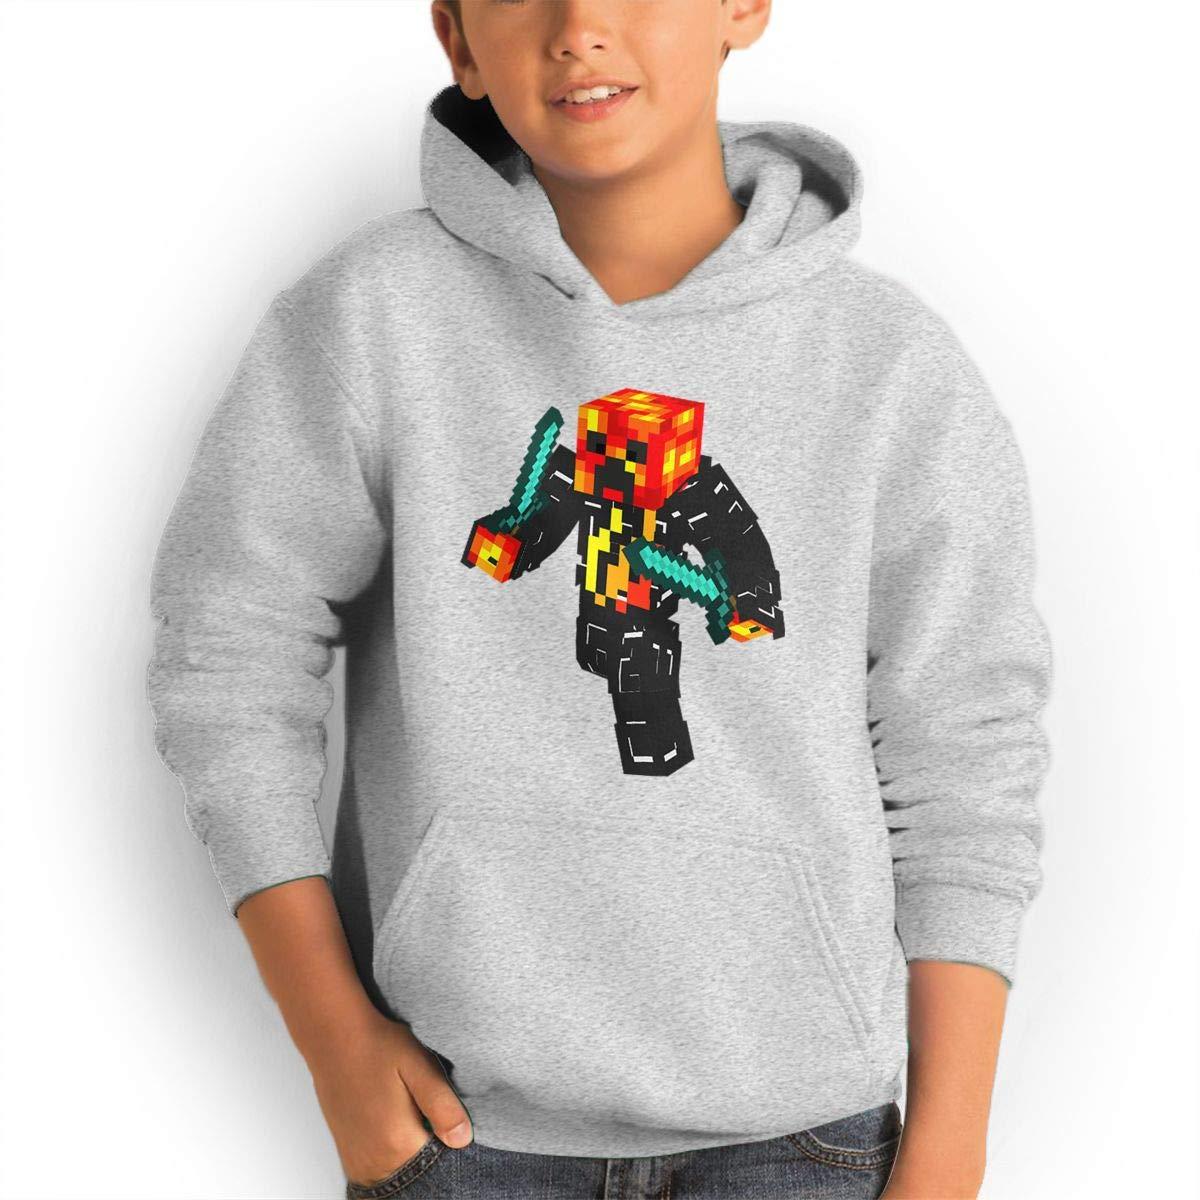 Red Coffee Teen Fashion Hoodie Hooded Sweatshirt Pocket Youth Boys Girls Sweaters,Preston-Playz